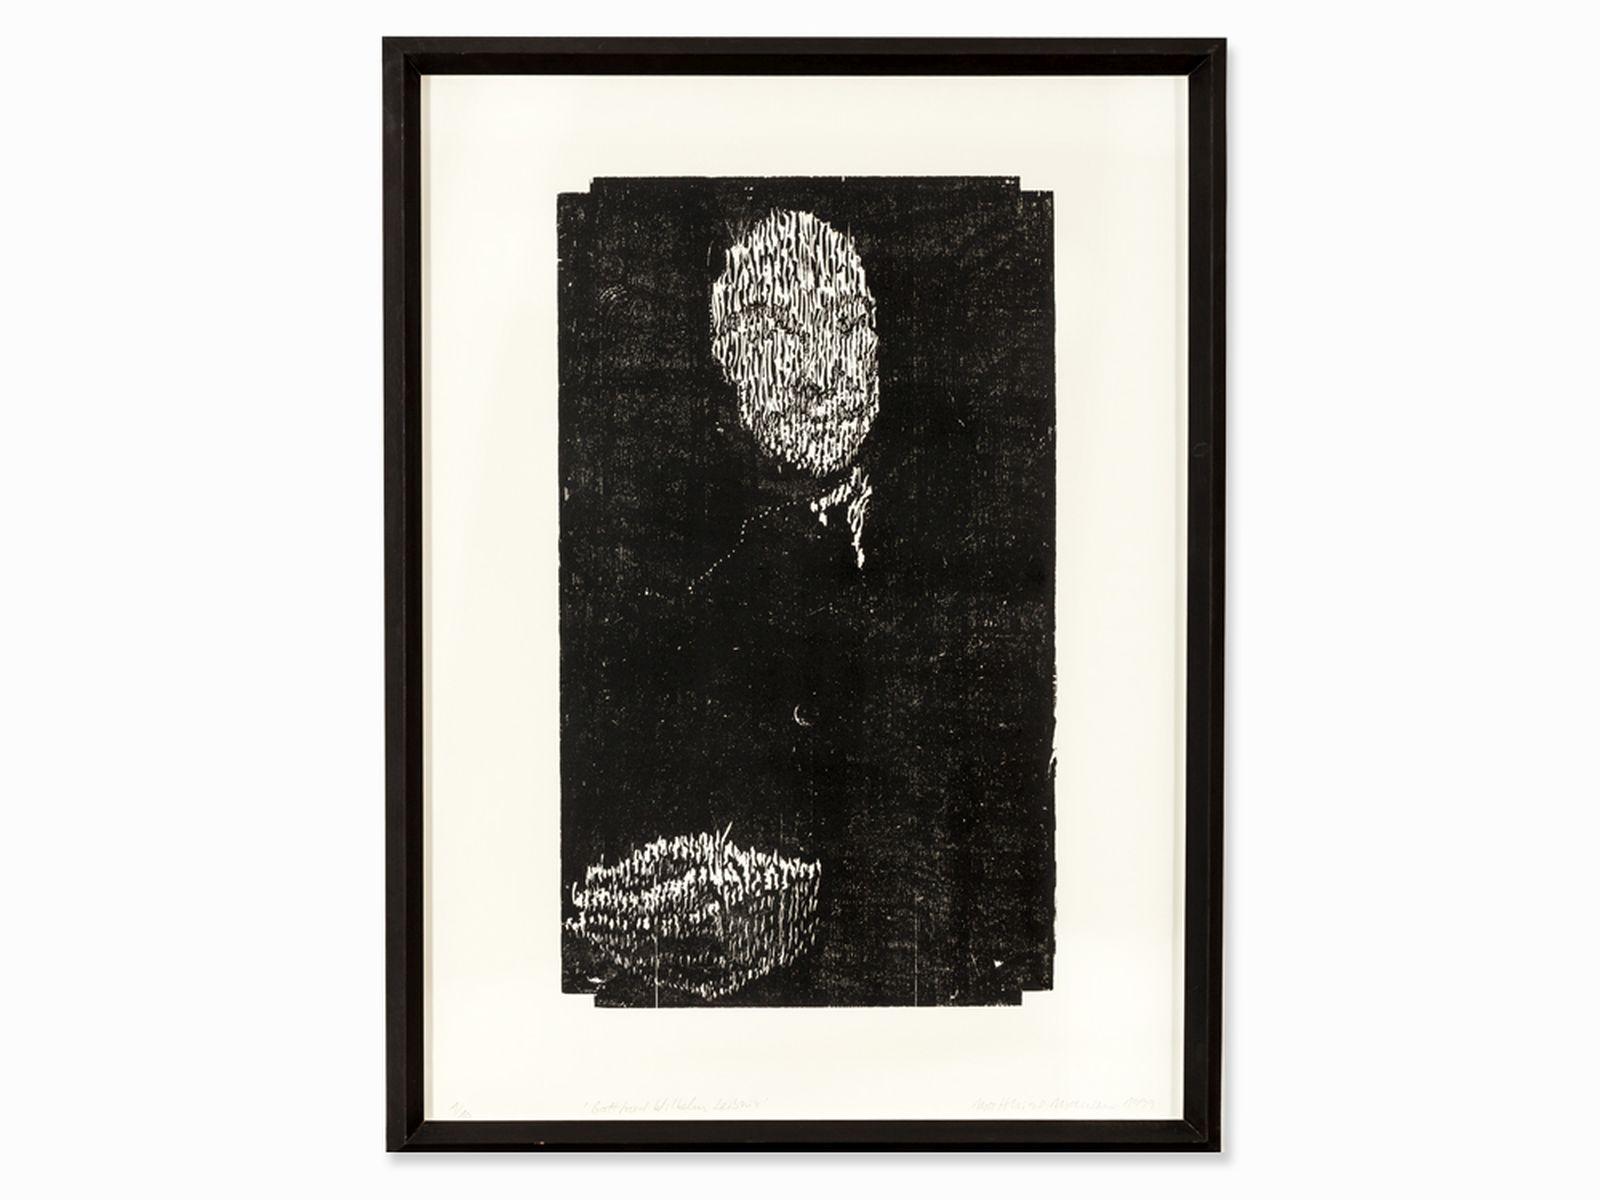 "#125 Matthias Mansen (b. 1958), G.W. Leibniz, Woodcut, 1999   Matthias Mansen (1958) ""G.W. Leibniz"" 1999 Image"